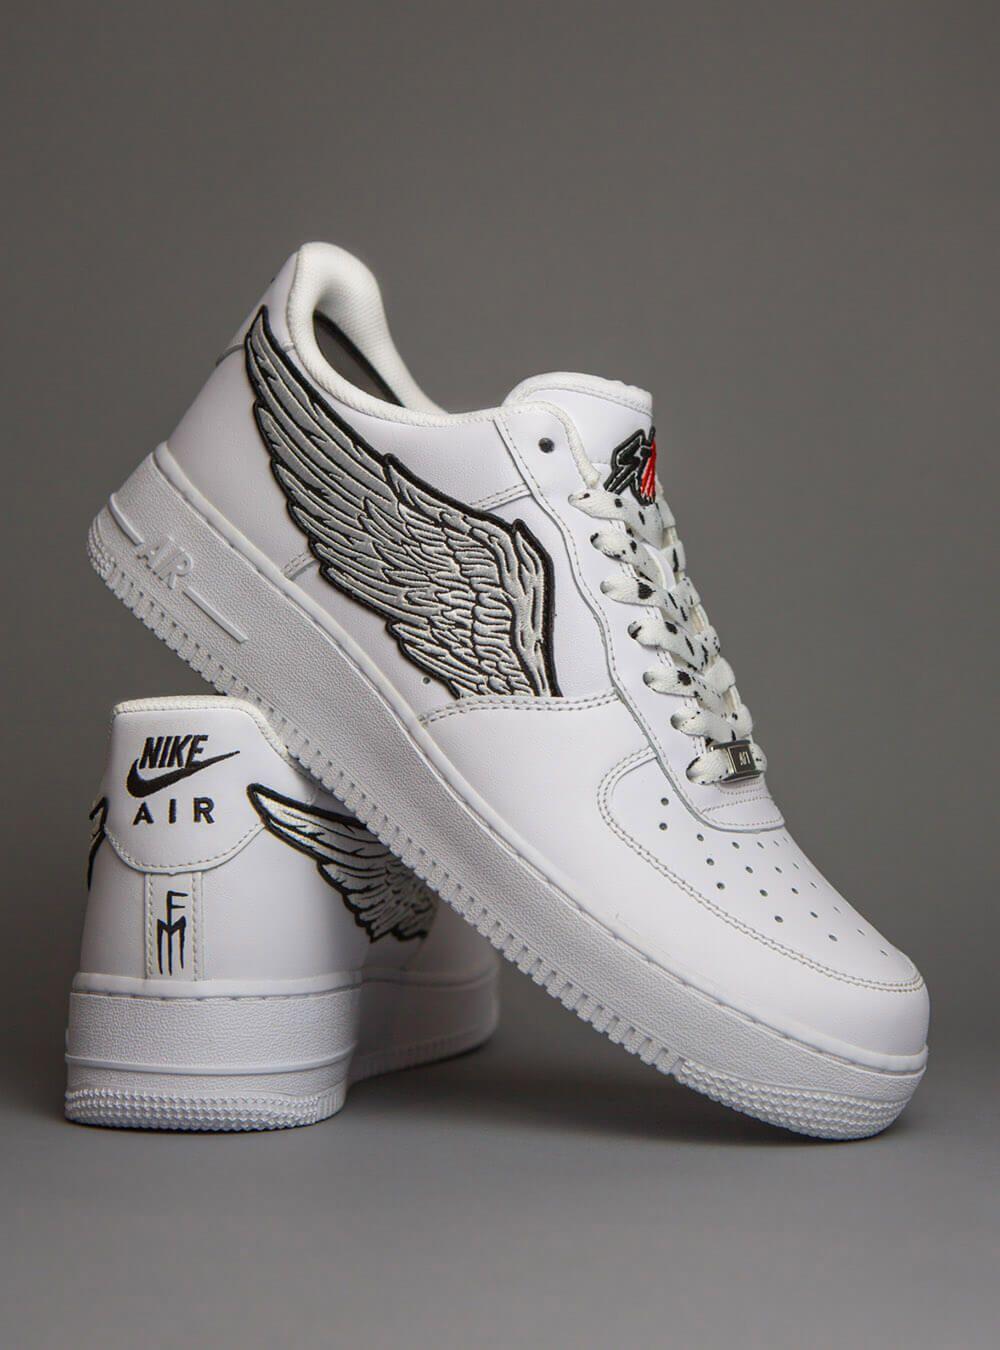 Pin on Custom Sneakers, Handmade Kicks